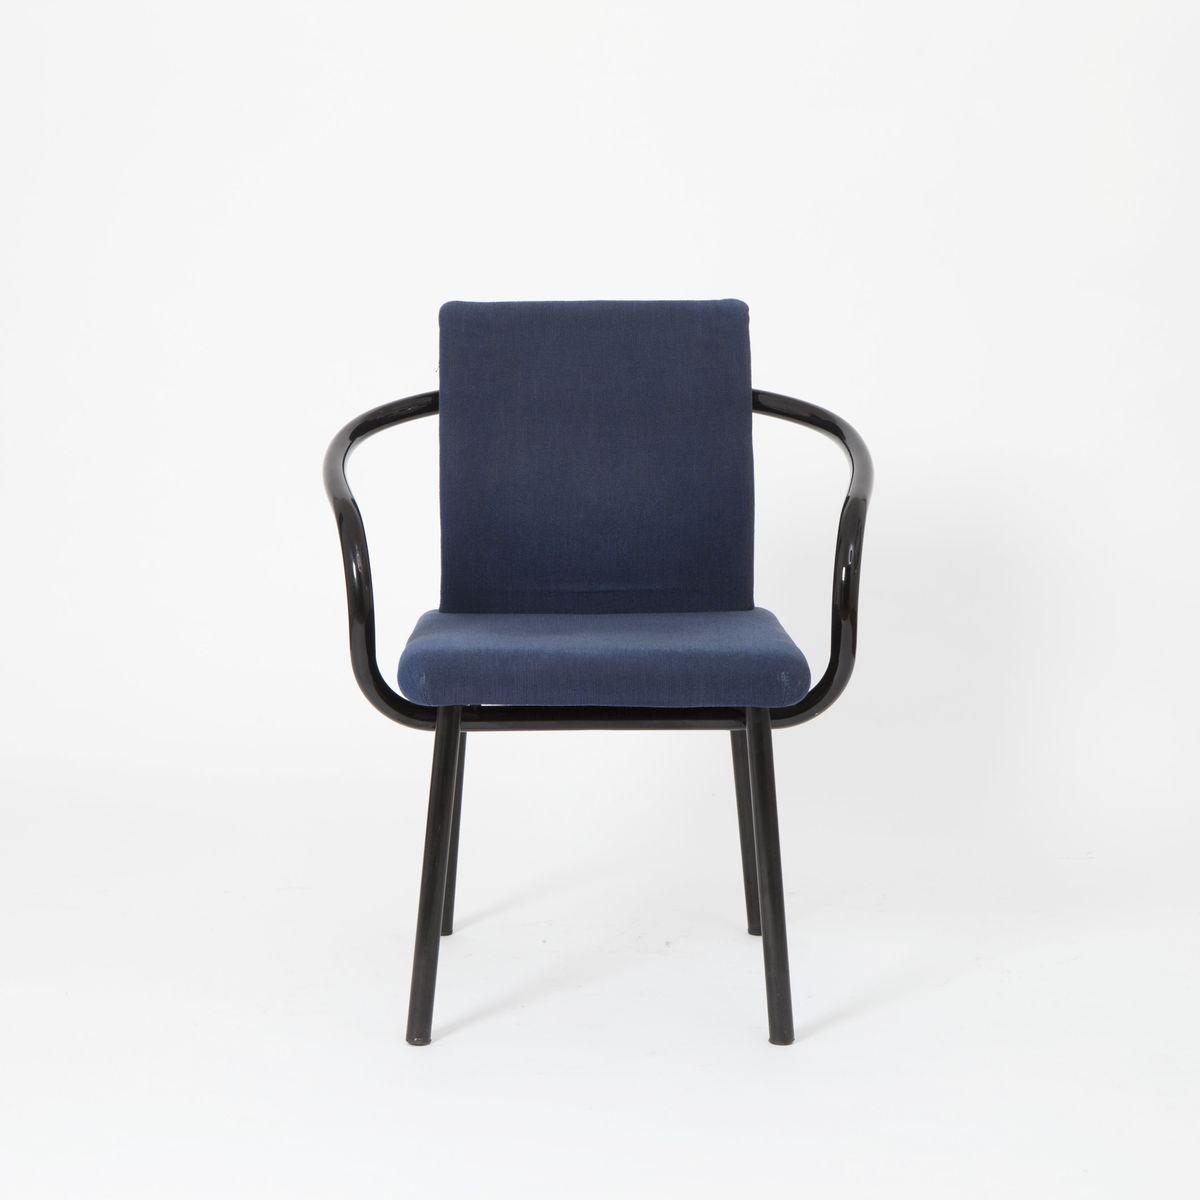 blaue mandarin st hle von ettore sottsass f r knoll. Black Bedroom Furniture Sets. Home Design Ideas